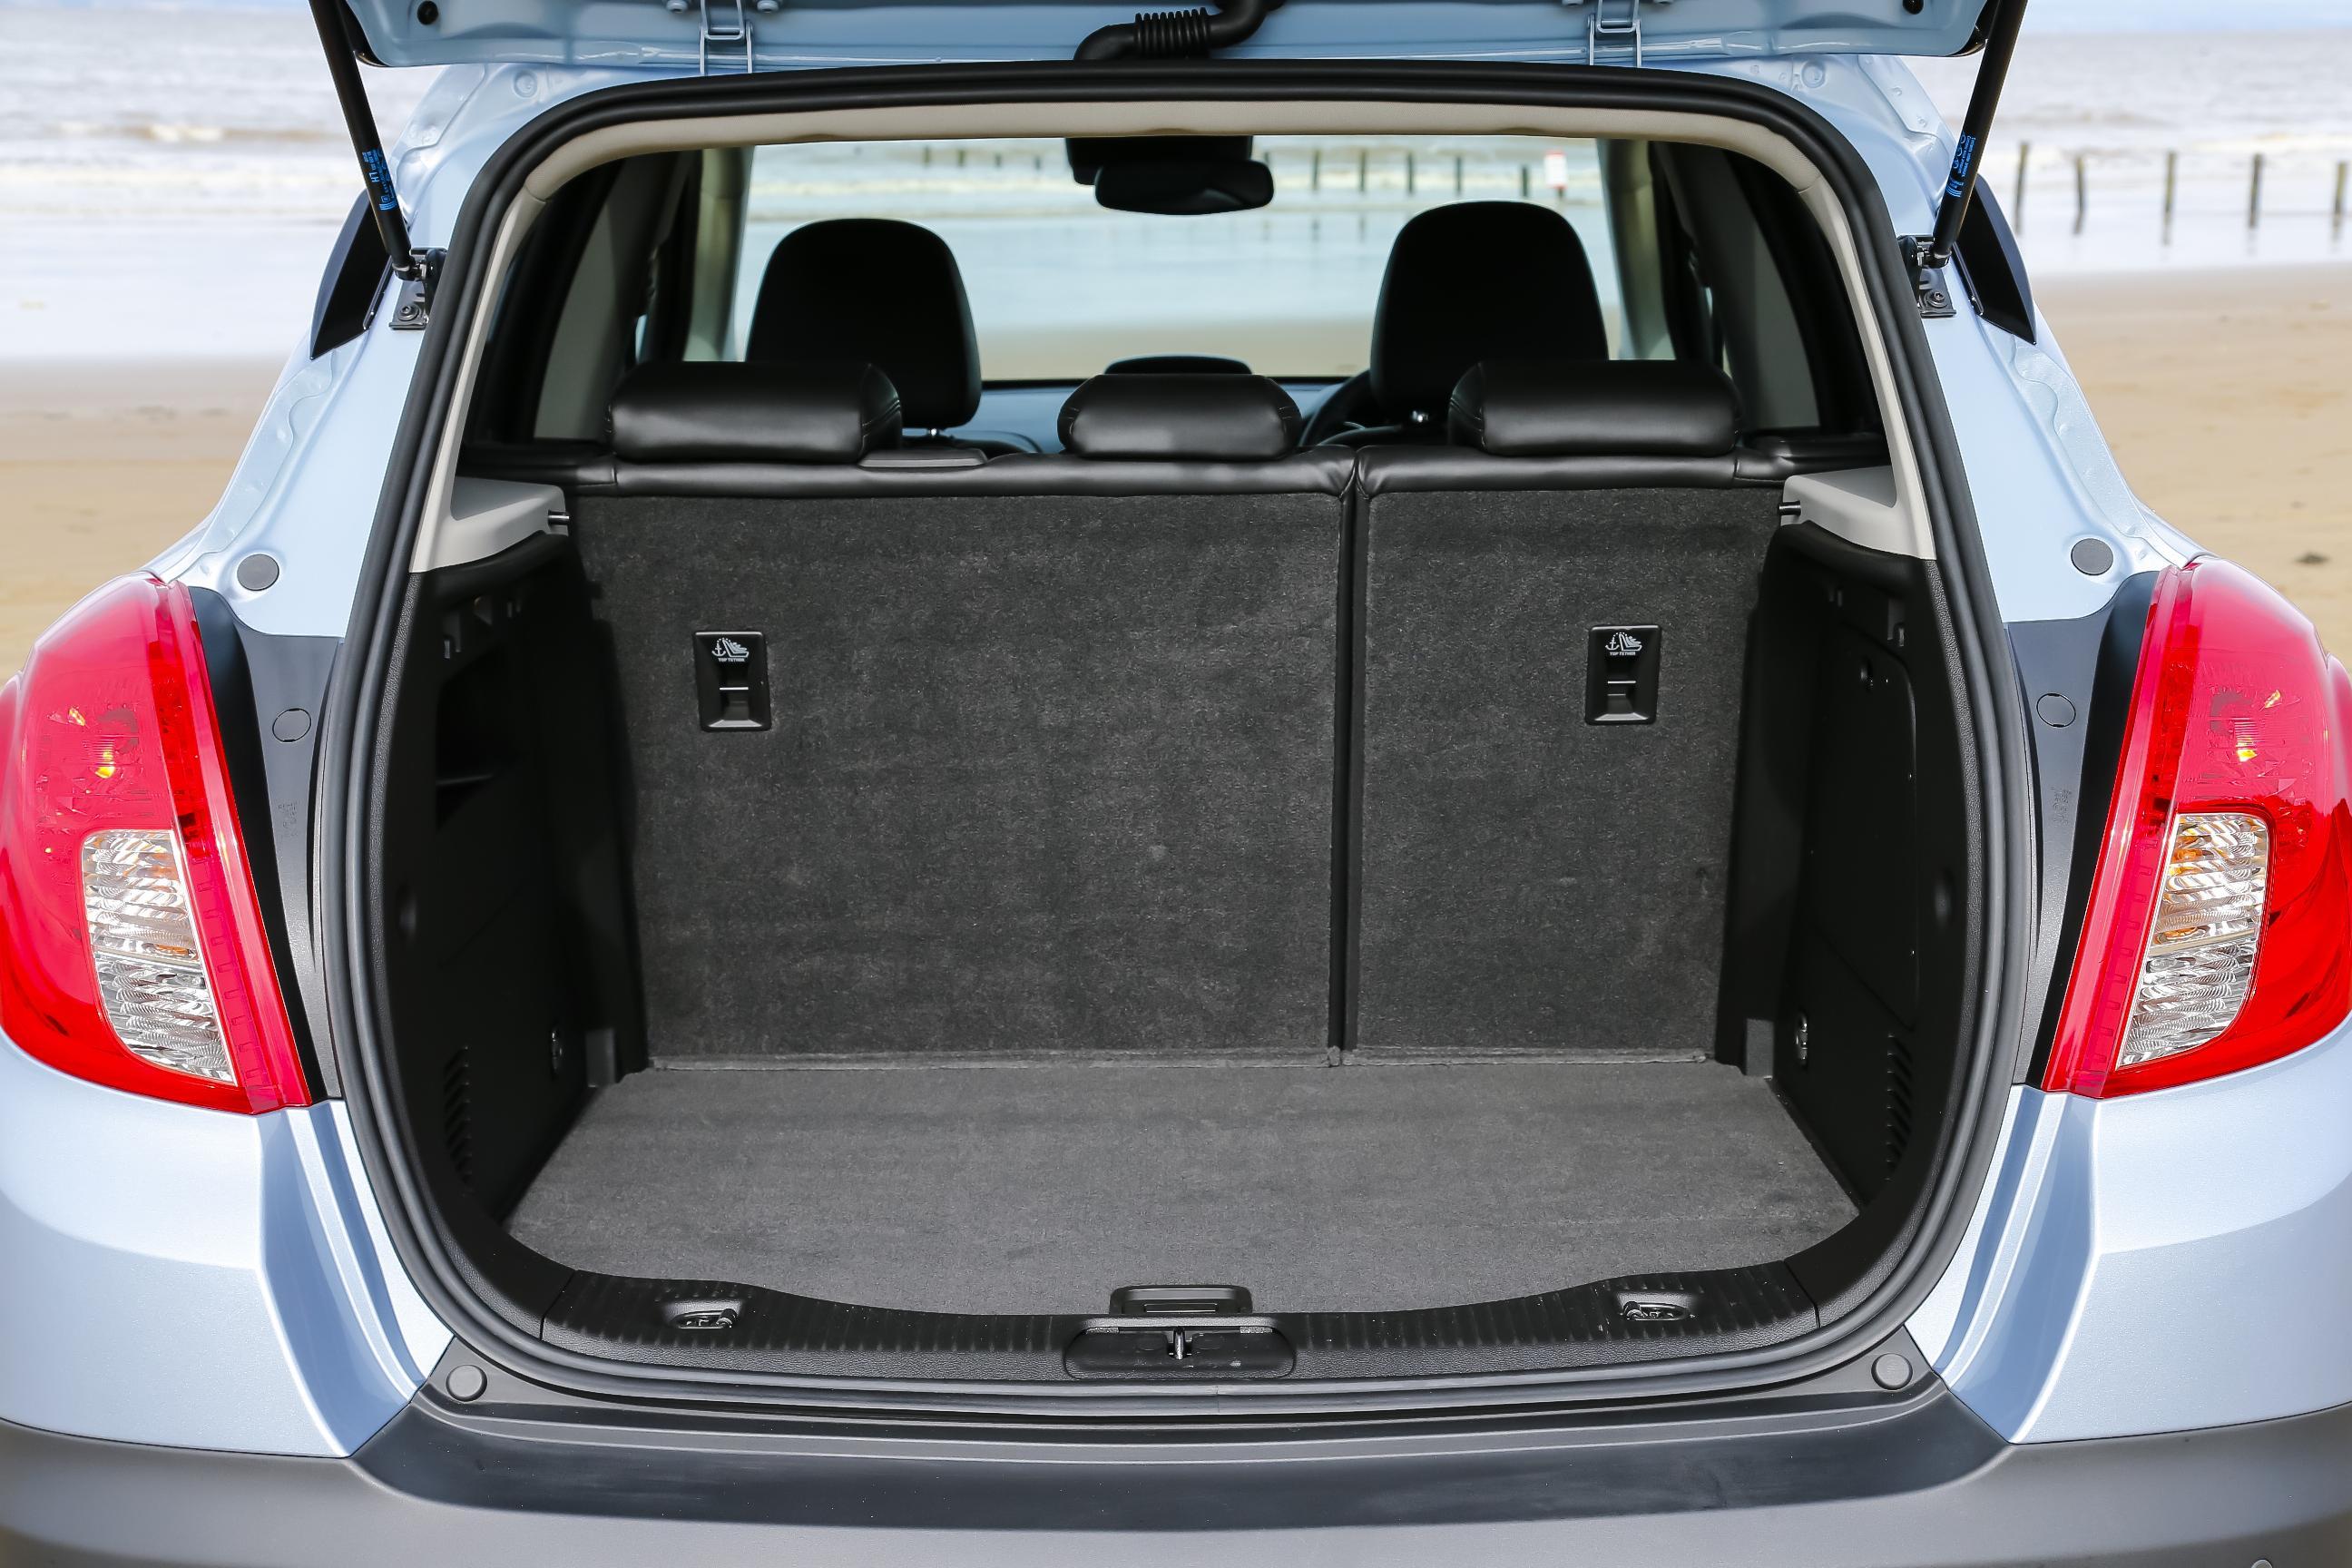 Vauxhall Mokka boot size